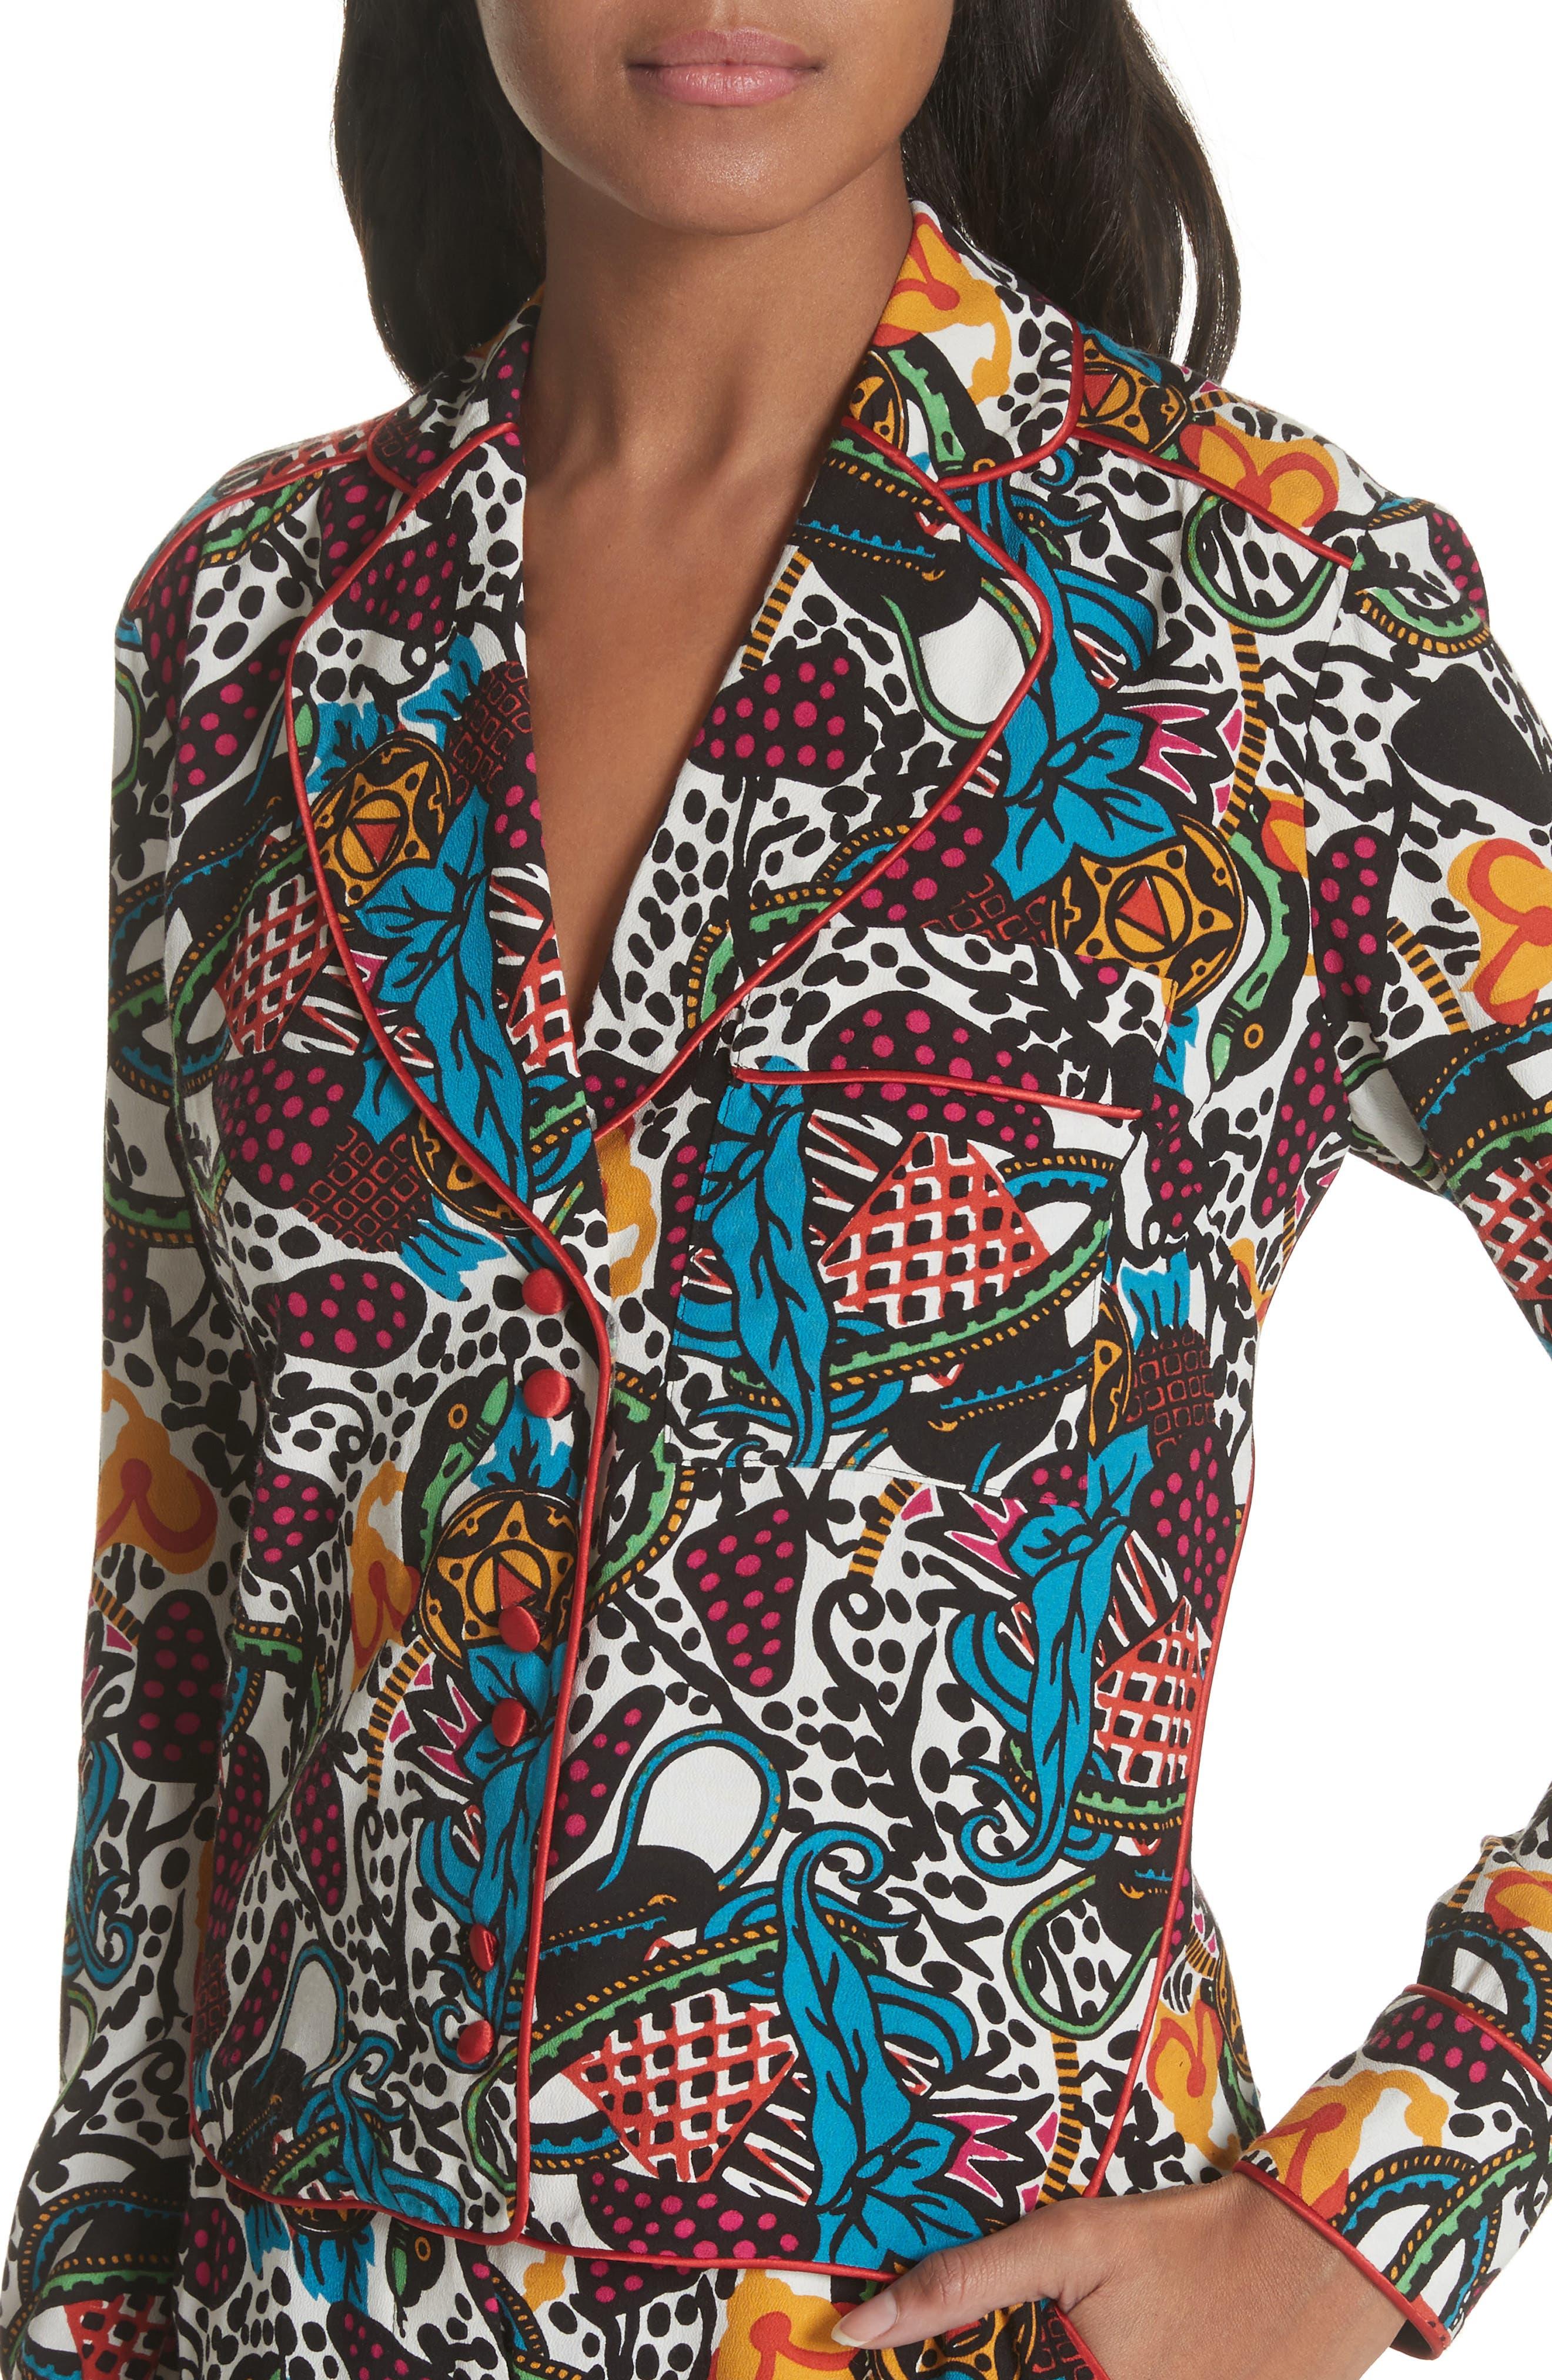 Penelope Pajama Shirt,                             Alternate thumbnail 4, color,                             Off White/ Blue/ Green/ Yellow